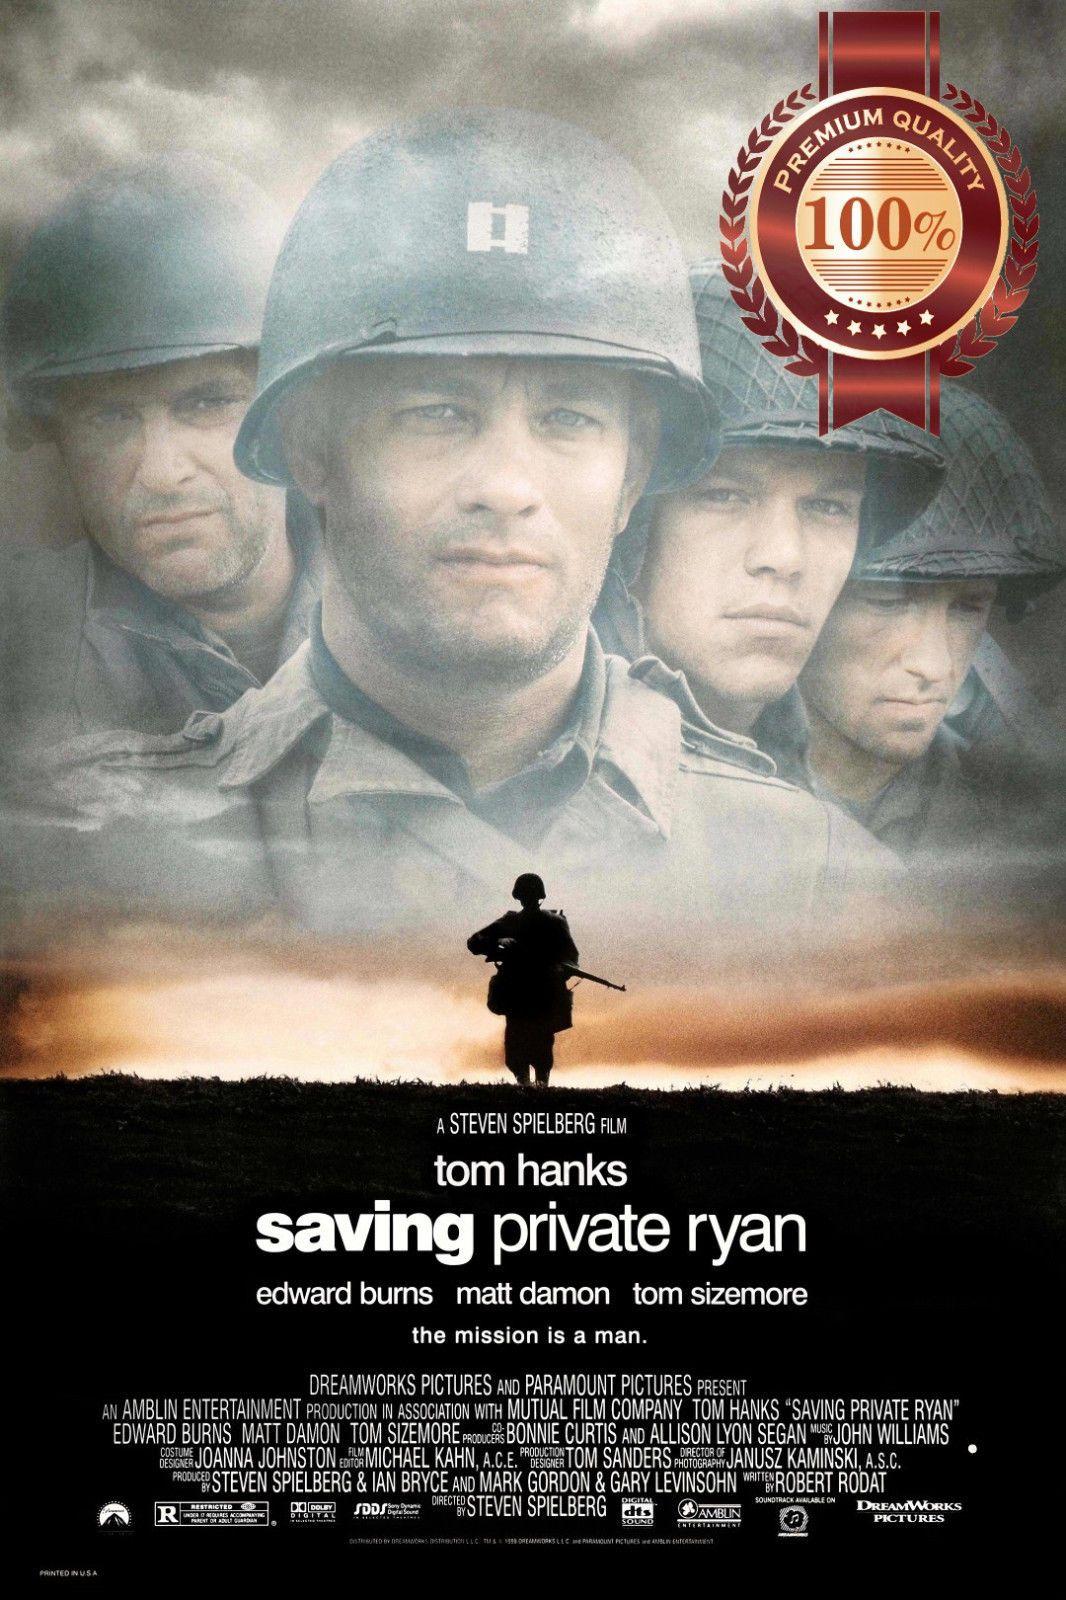 Saving Private Ryan 1998 Tom Hanks Movie Original Photo Print Premium Poster Saving Private Ryan Best Movies To See Matt Damon